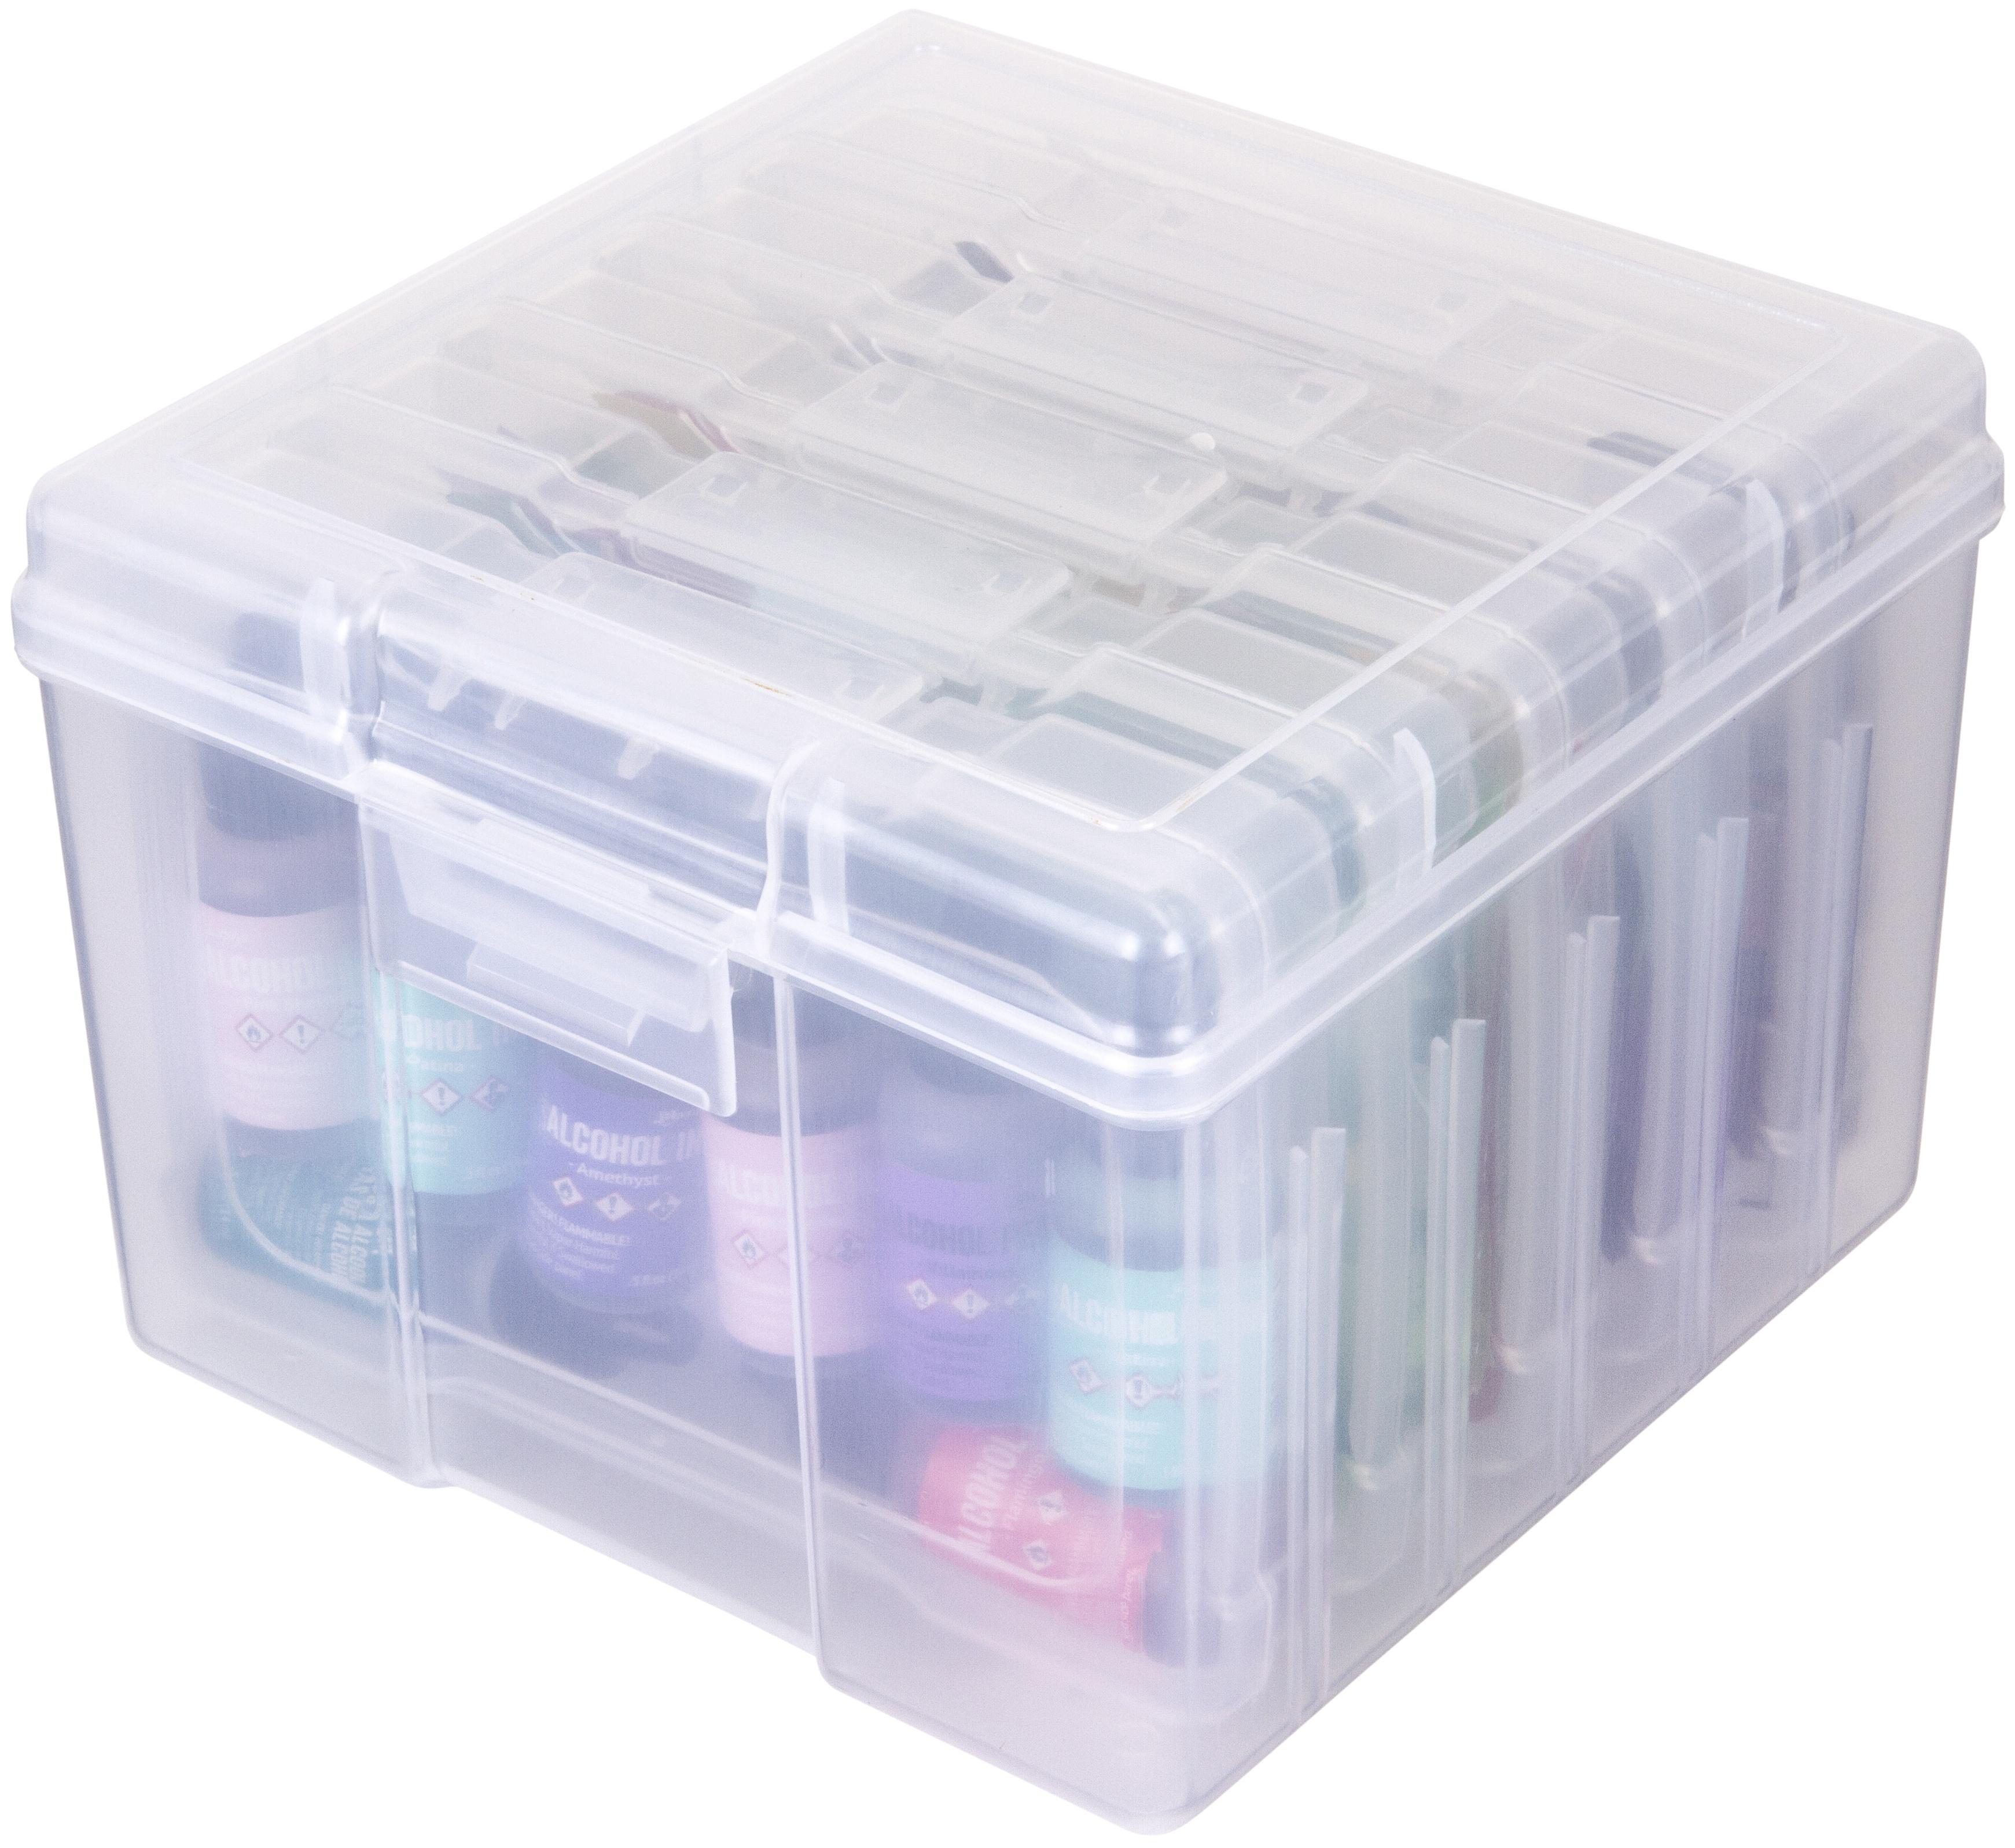 ArtBin Photo & Craft Supply Box-(1)large 7.5X7.2X5.2 (5) Small 4X6